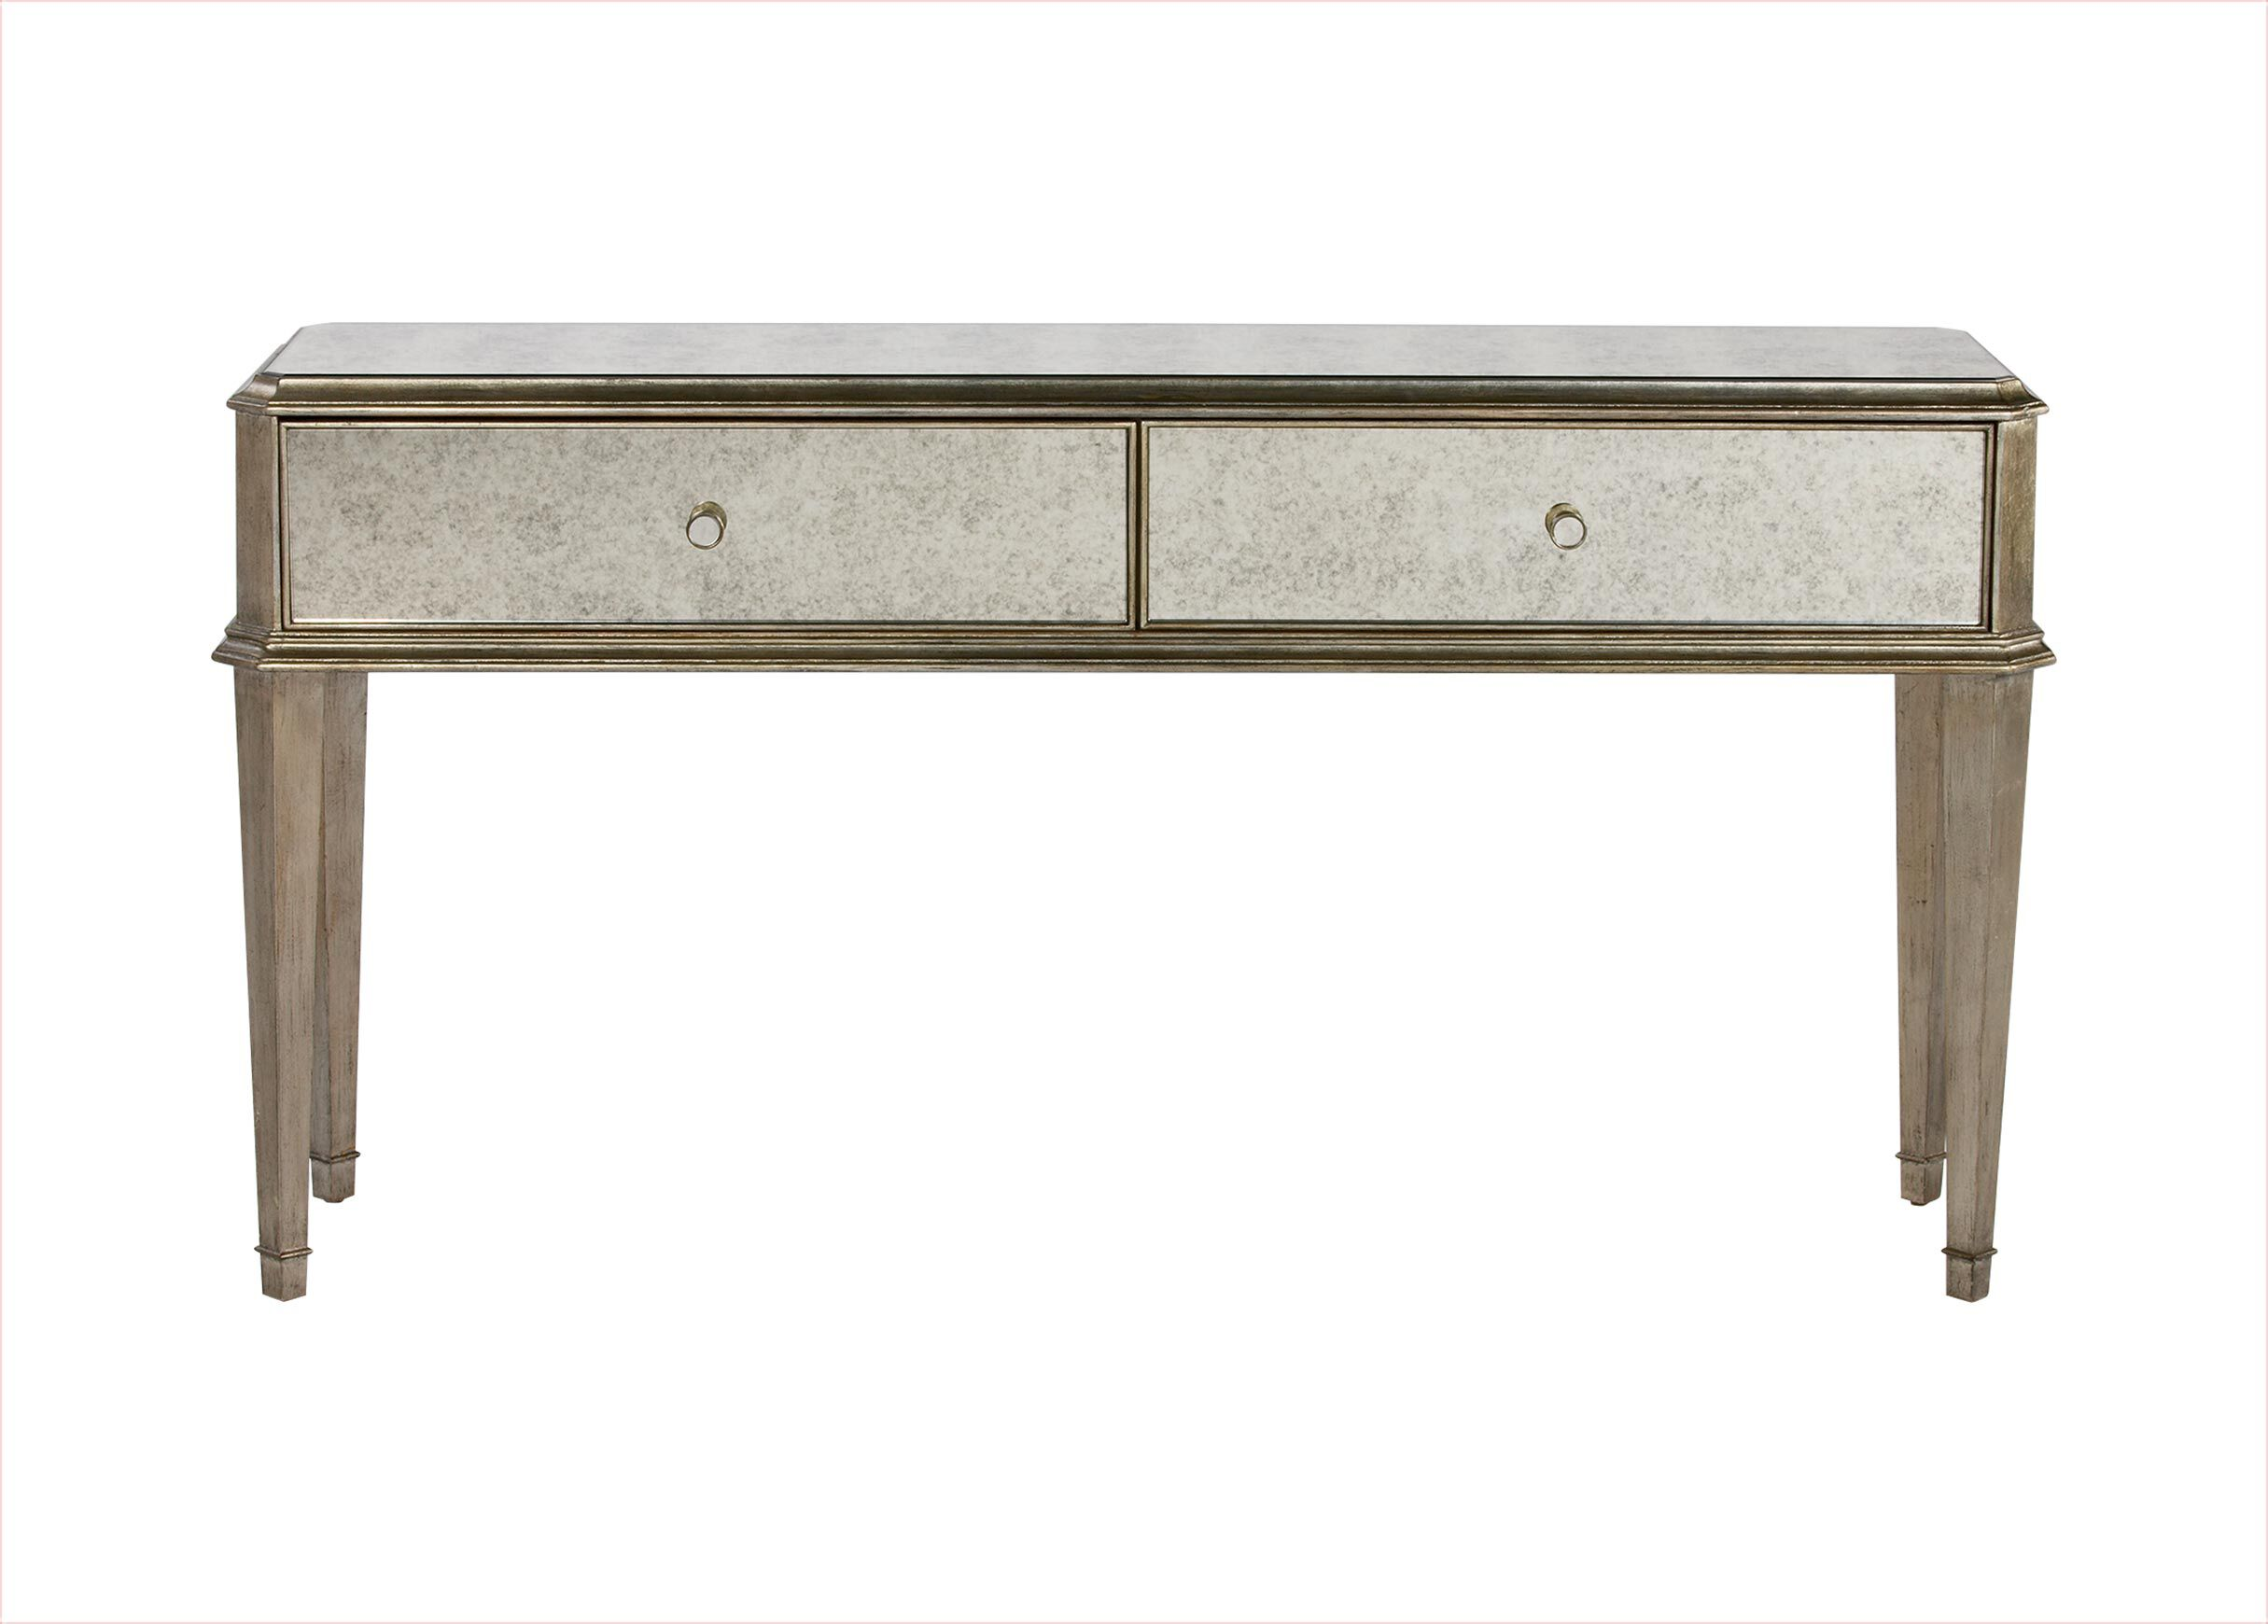 renate gray sofa table modern bed convertible vivica console tables